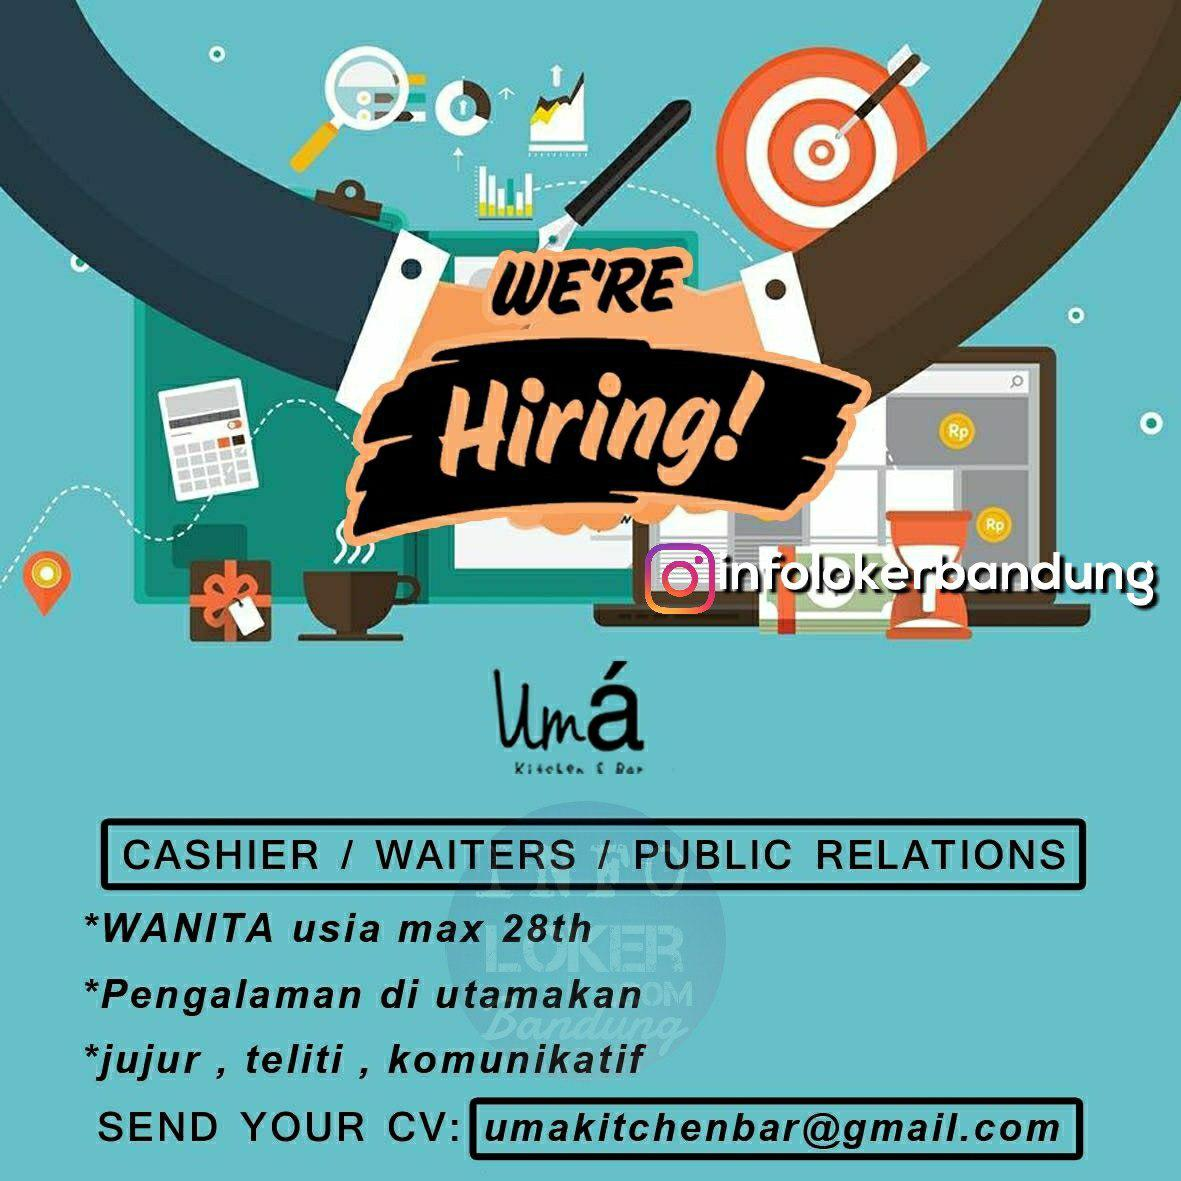 Lowongan Kerja Uma Kitchen & Bar Bandung Juni 2018